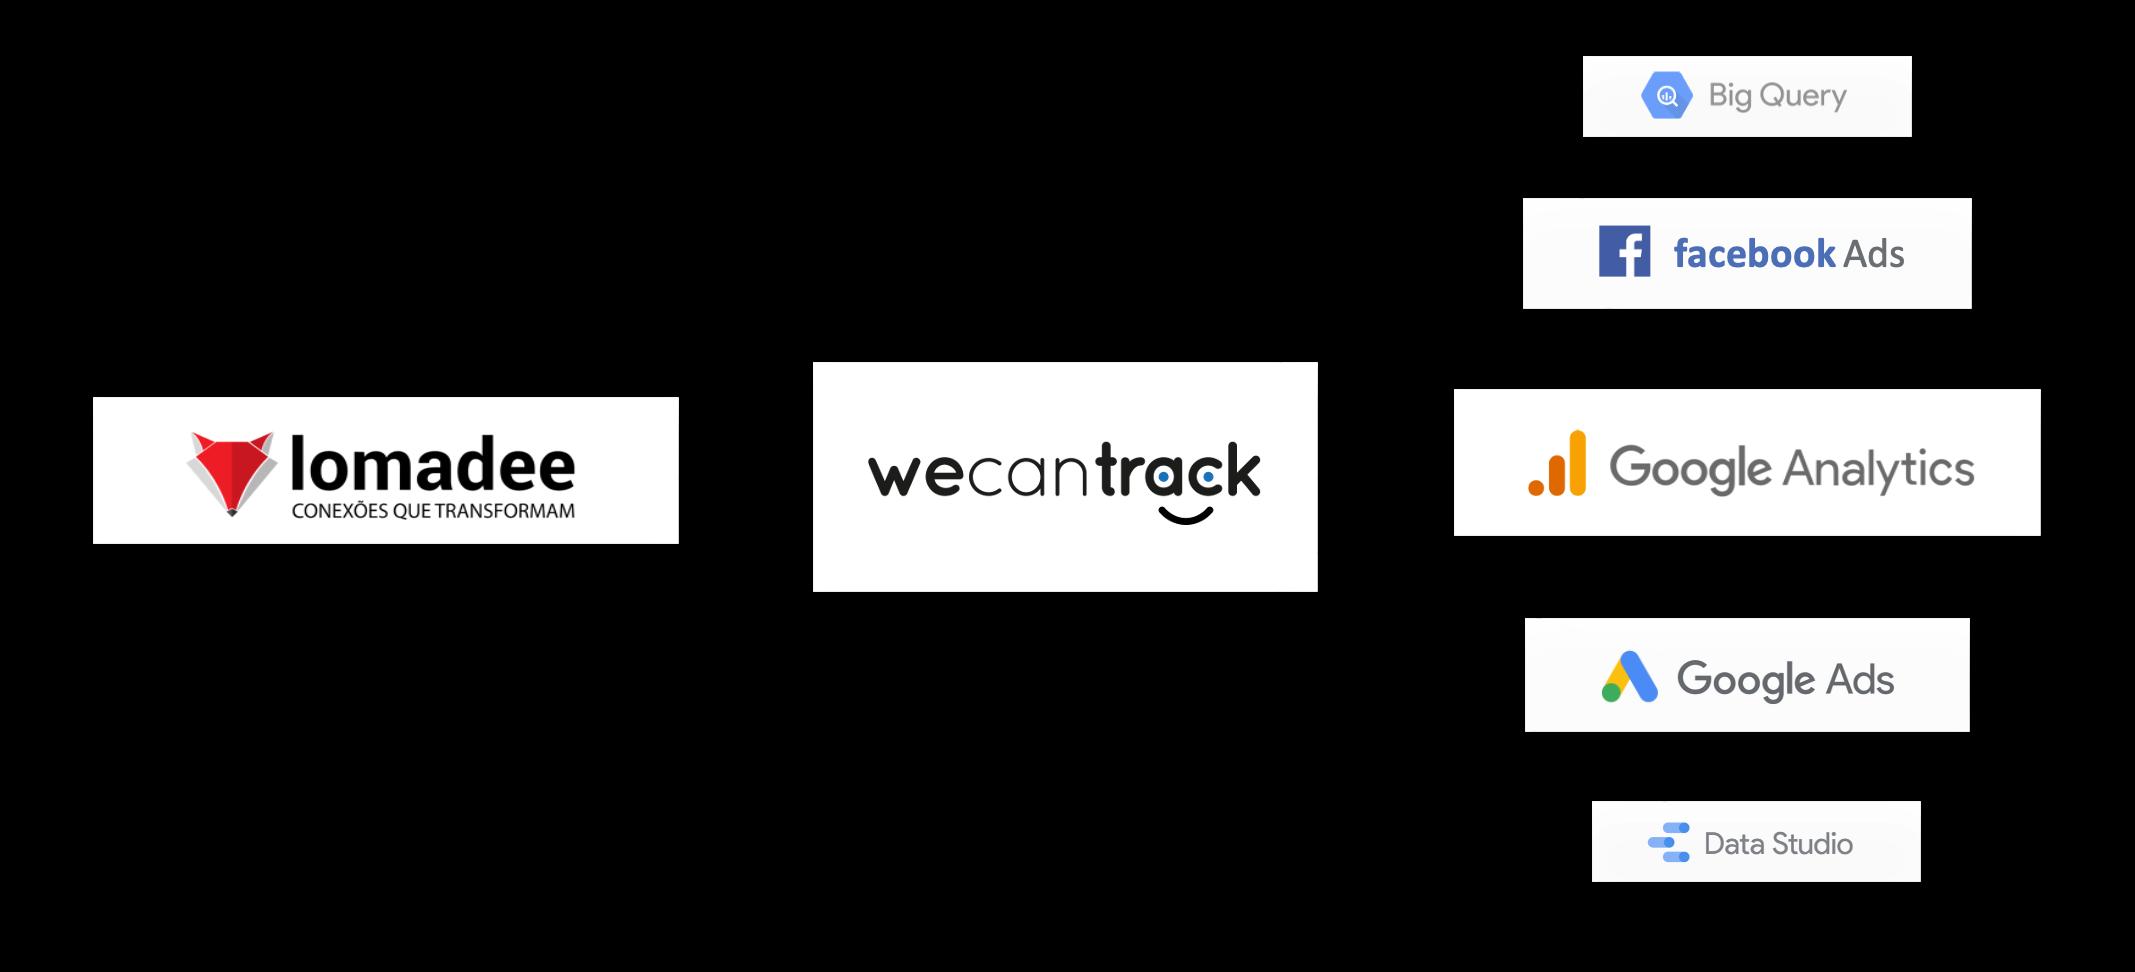 integrate-lomadee-affiliate-conversions-via-postback-url